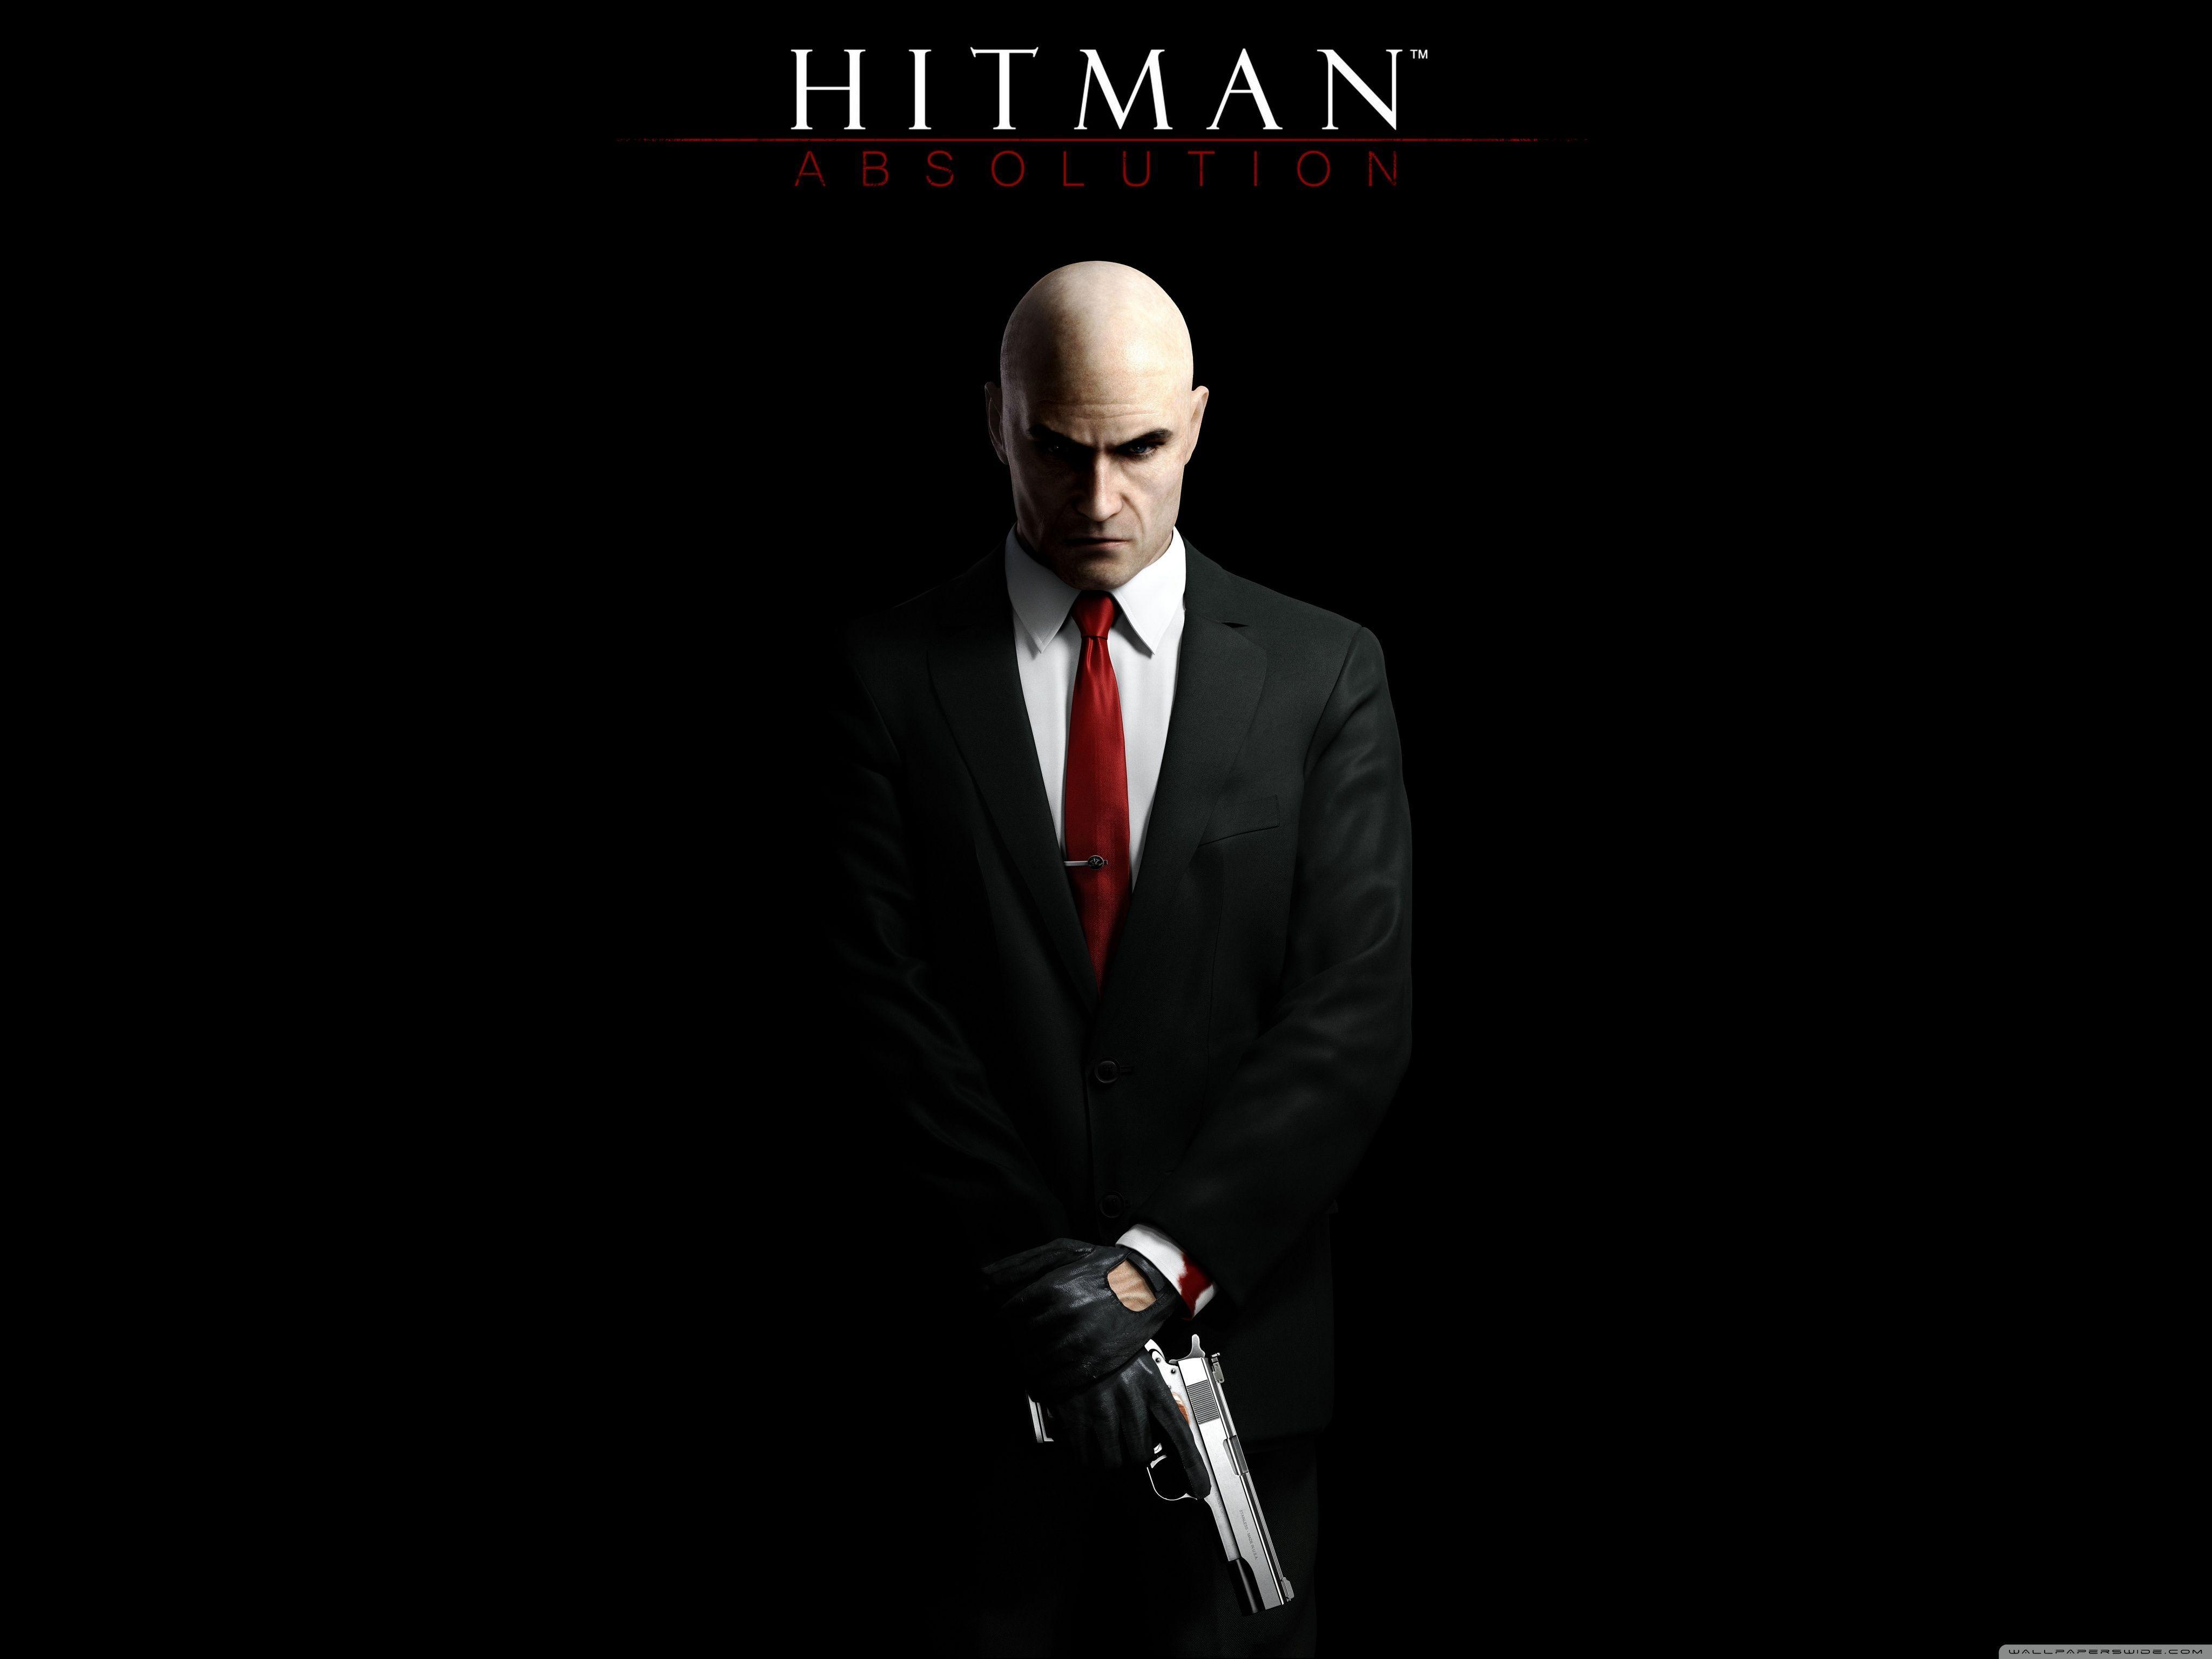 agent 47 hitman 2 wallpaper